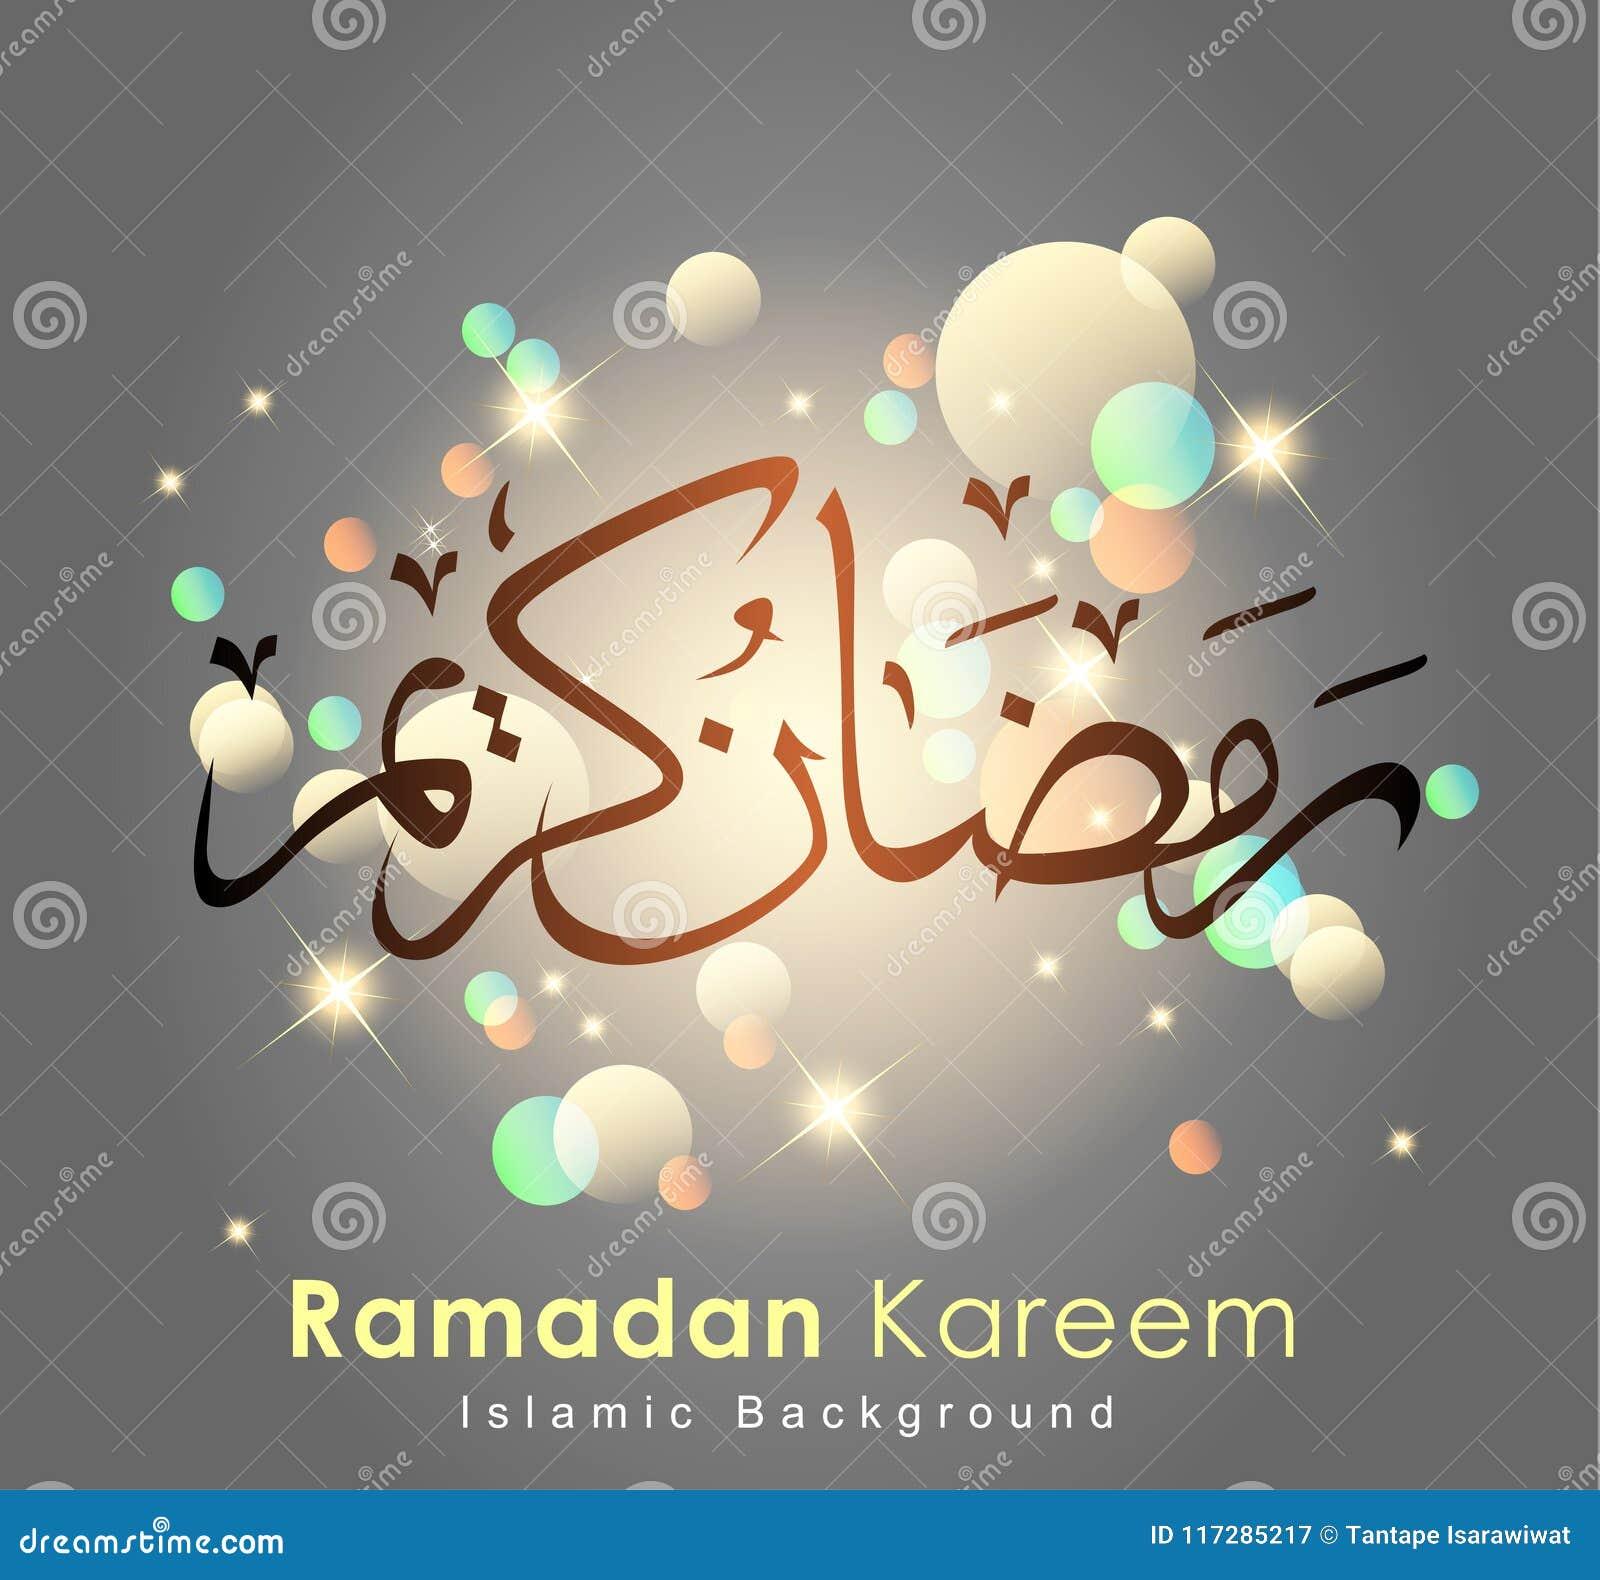 Ramadan greetings in arabic scrip stock vector illustration of download ramadan greetings in arabic scrip stock vector illustration of color holy 117285217 m4hsunfo